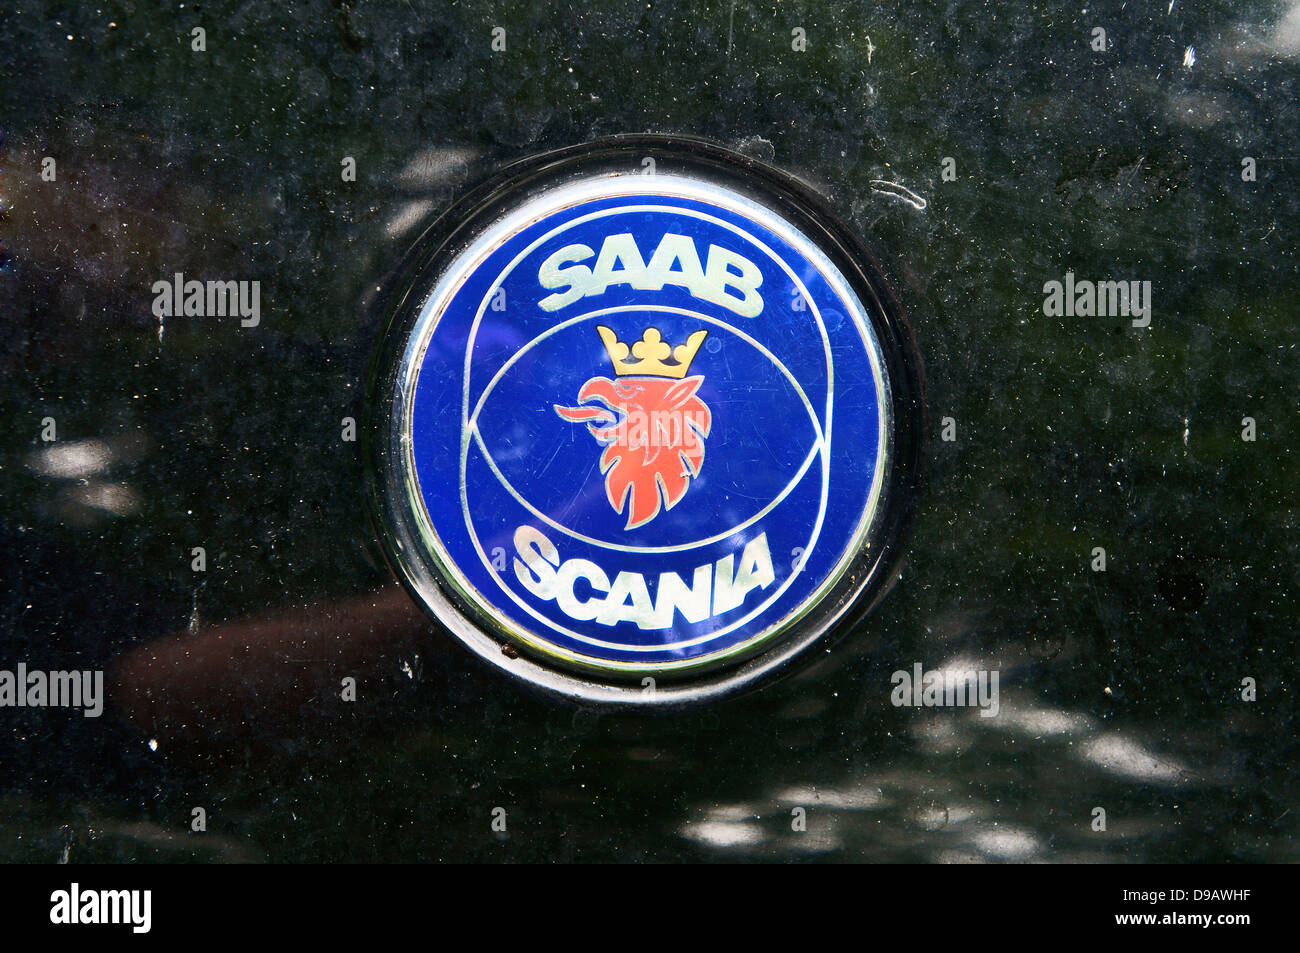 scania logo stock photos amp scania logo stock images alamy